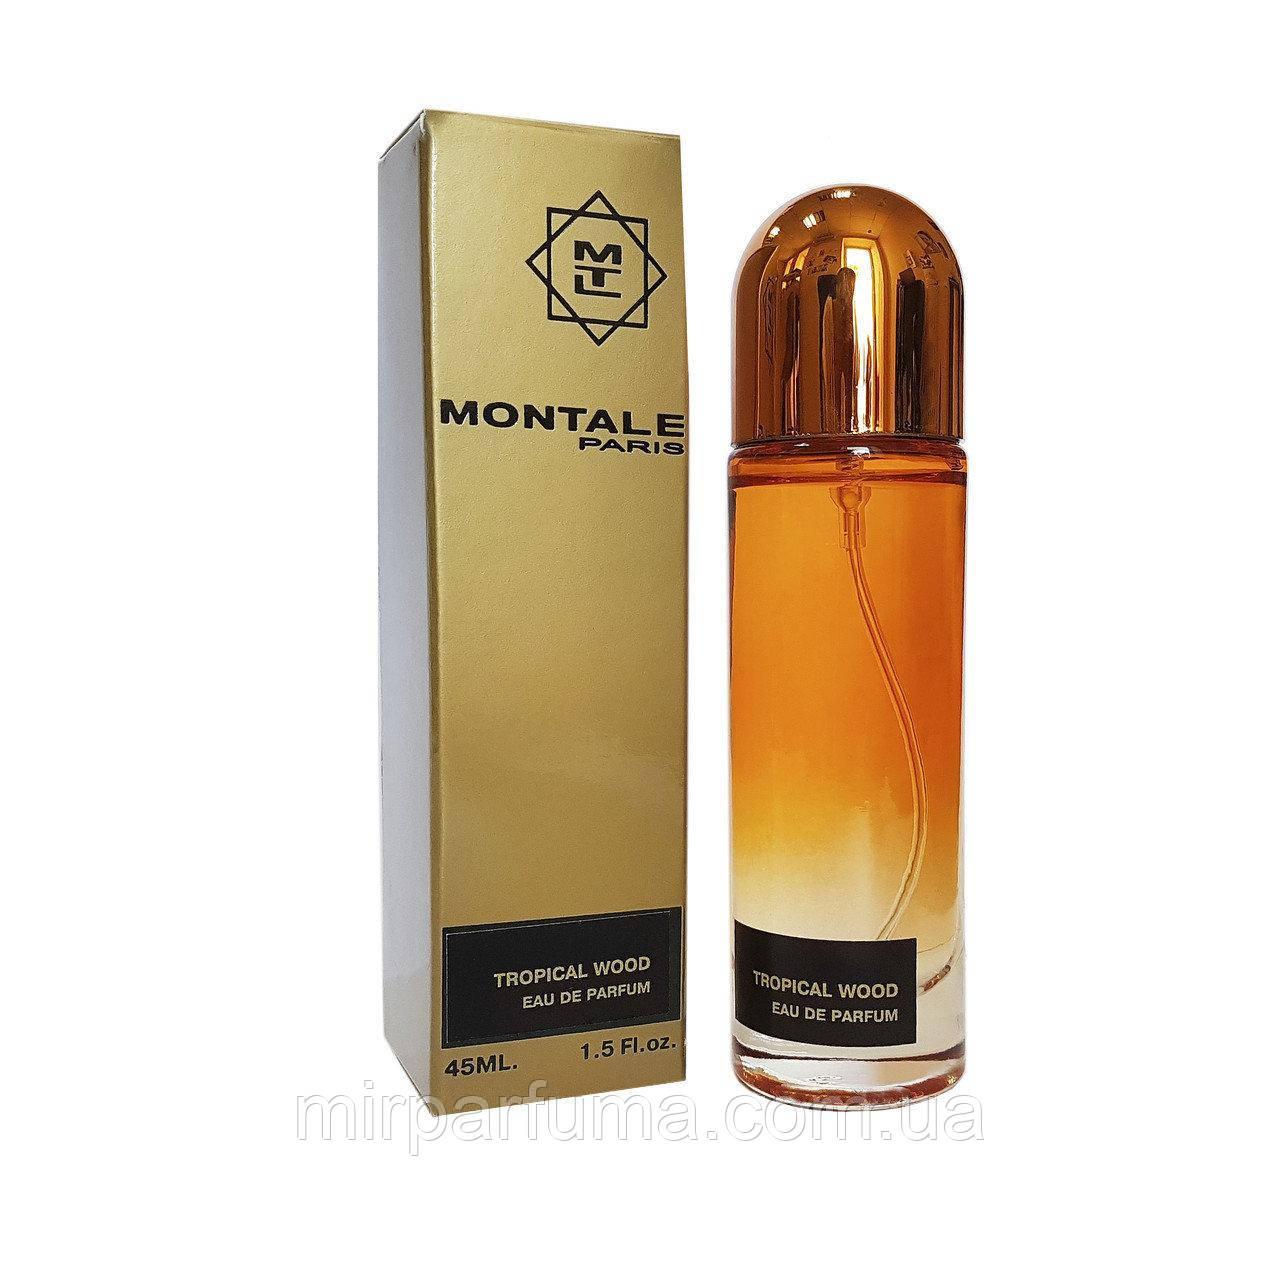 Парфюмерия унисекс Монталь Montale Tropical Wood edp 45ml